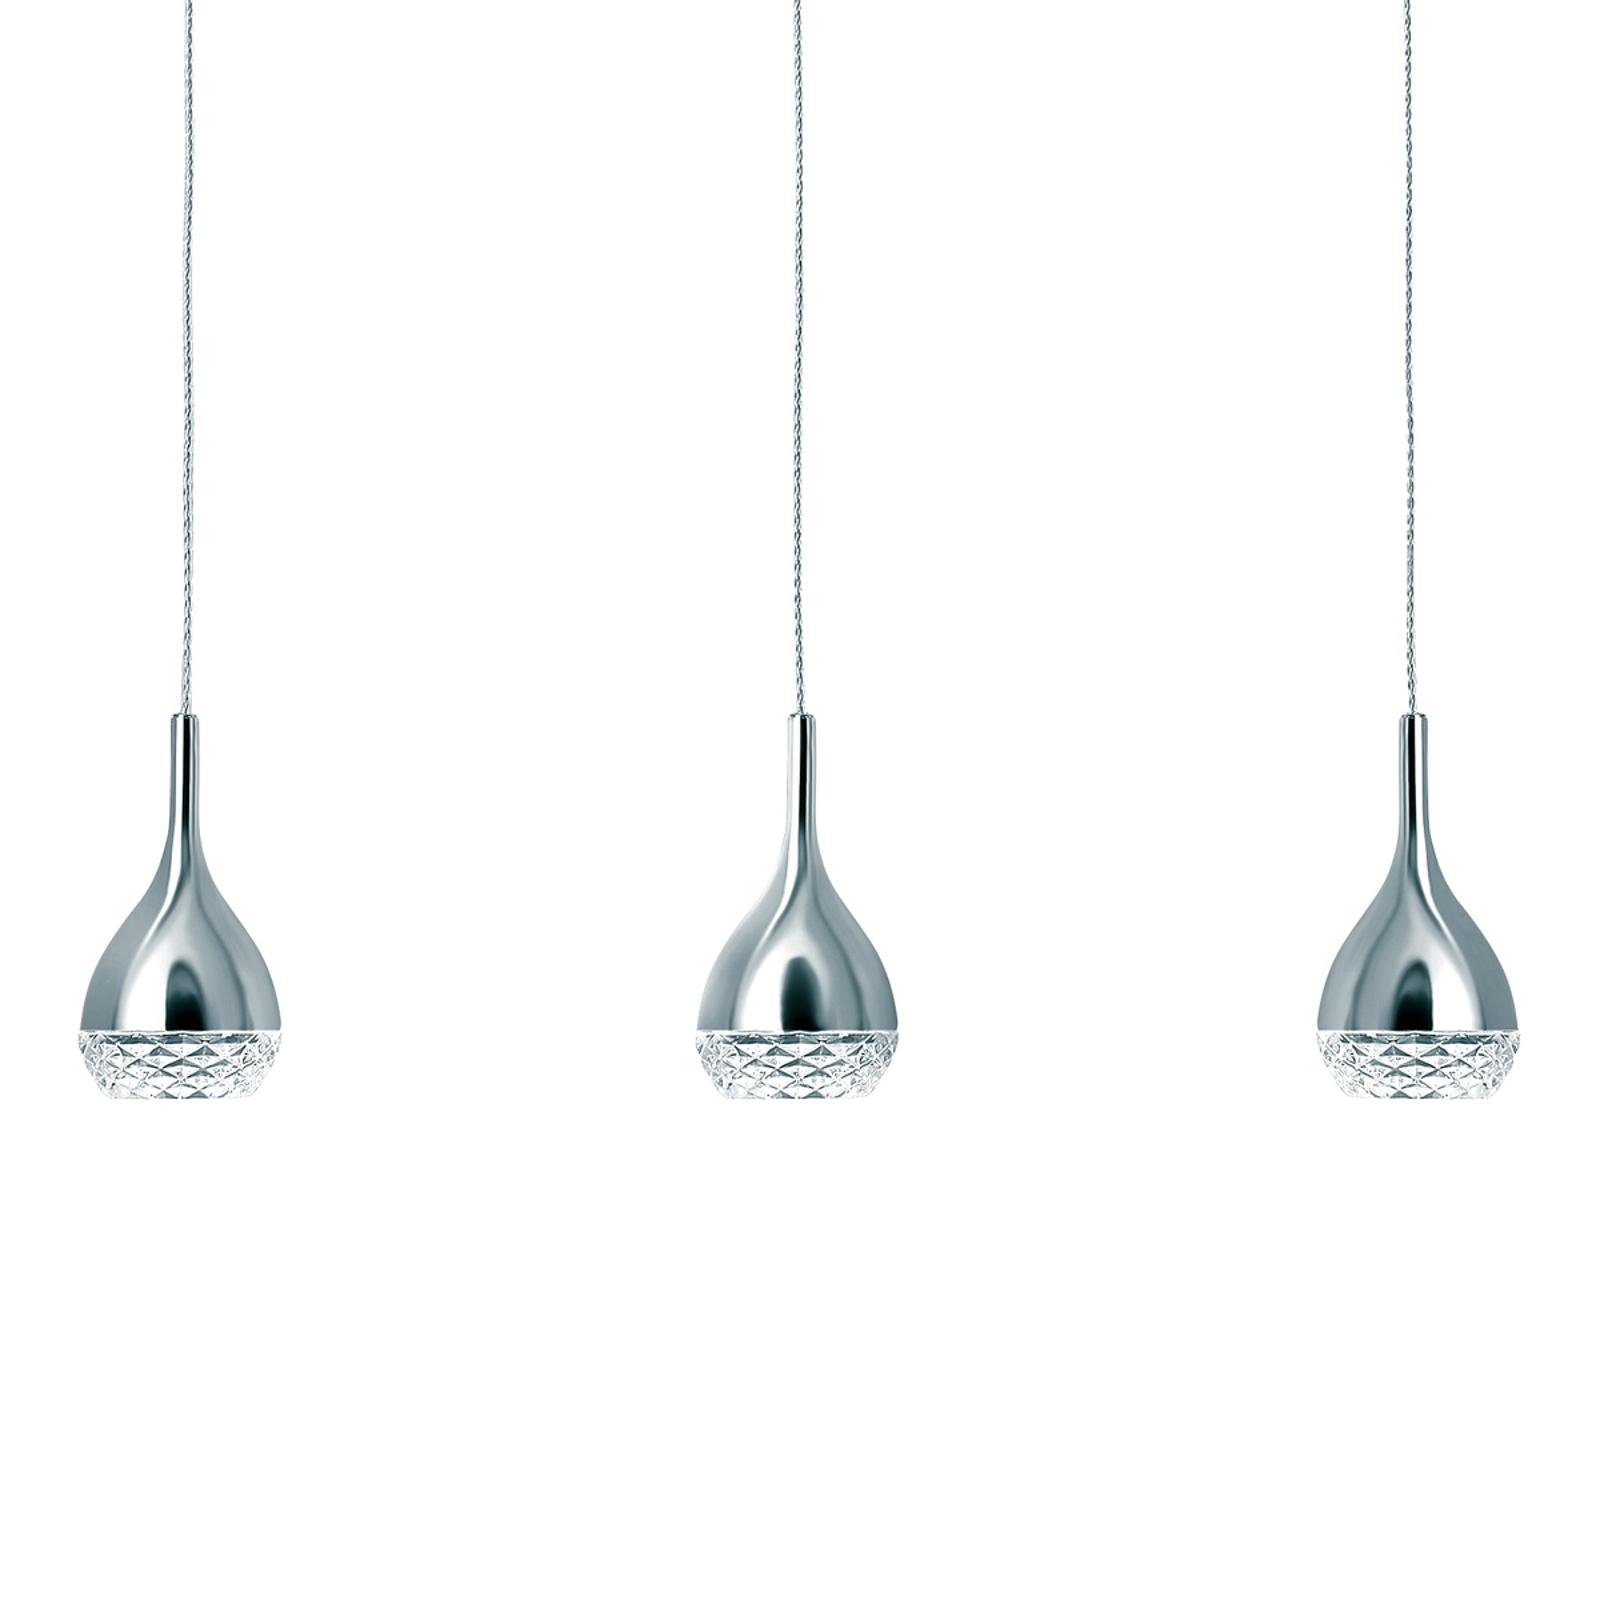 Hanglamp Khalifa in chroom, met drie lampjes